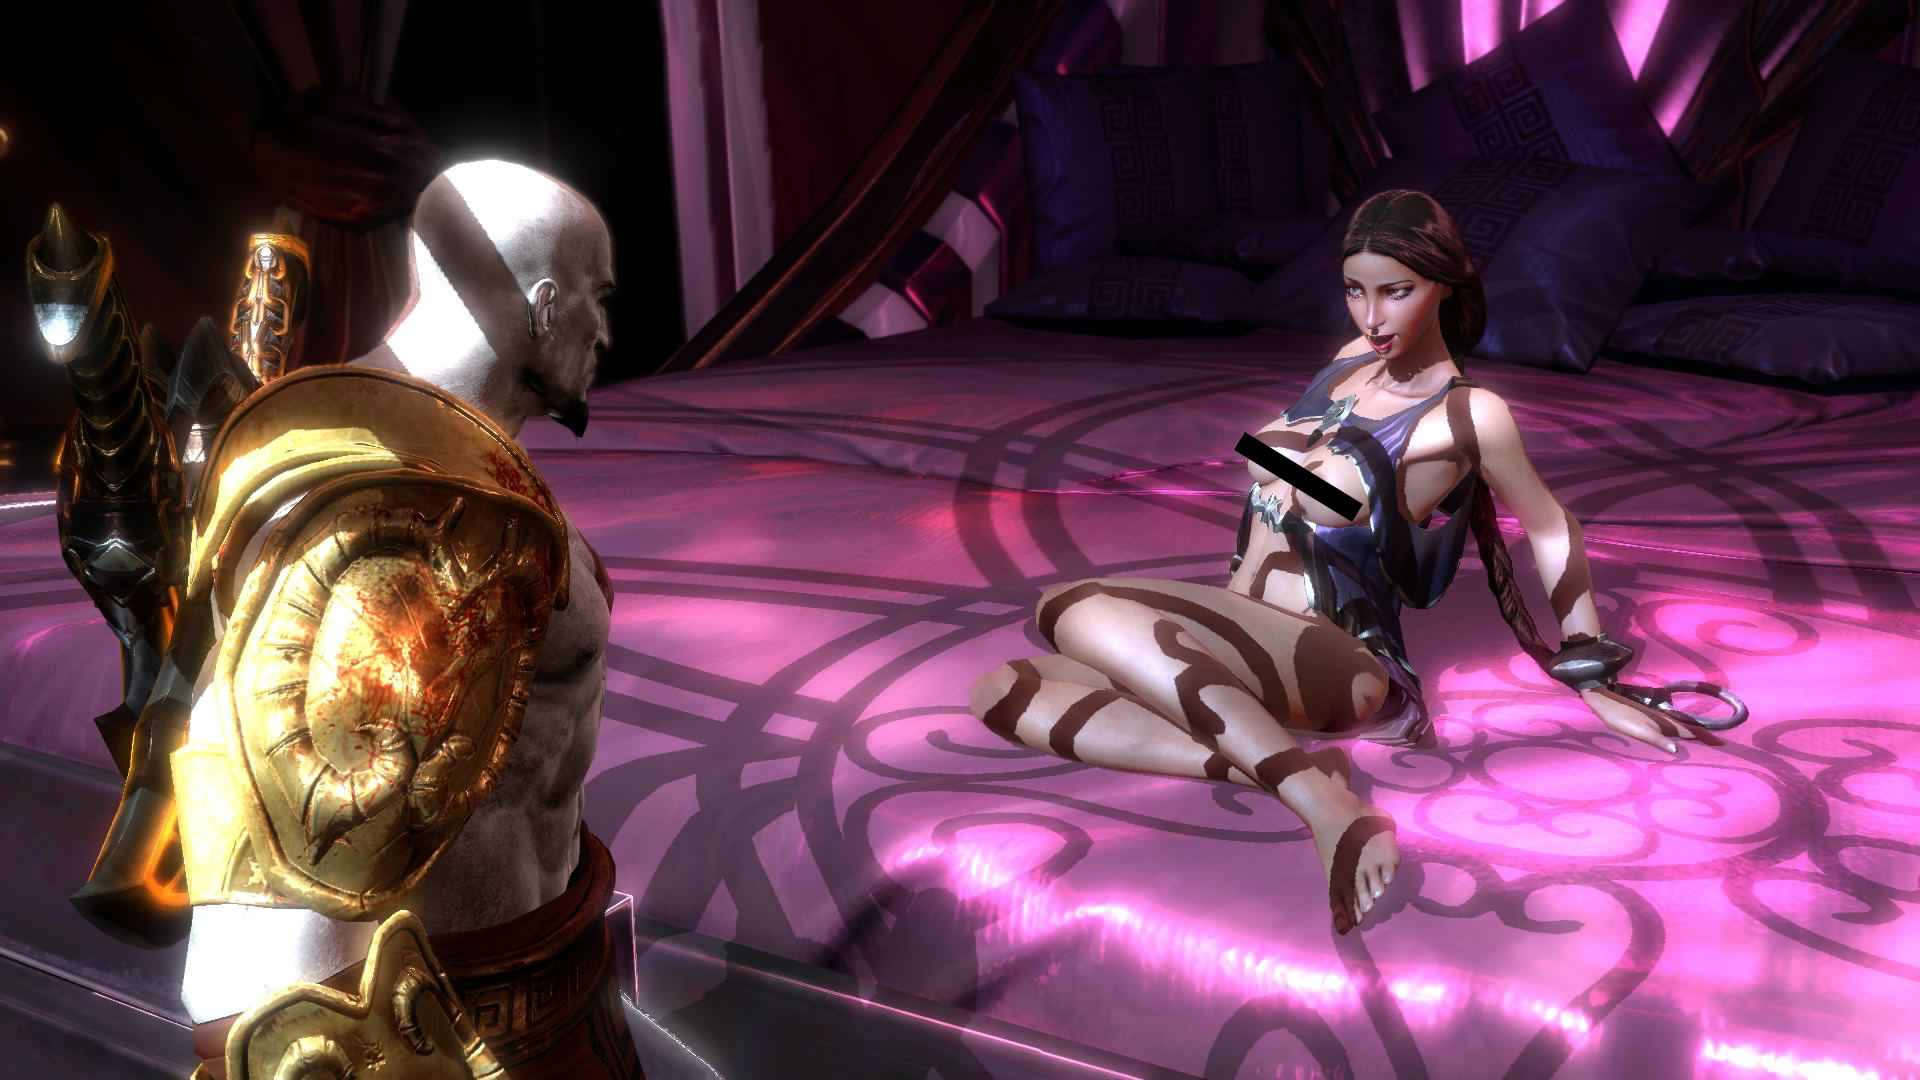 Afrodita_provocando_a_Kratos.png  (640 × 480 píxeles; tamaño de ...